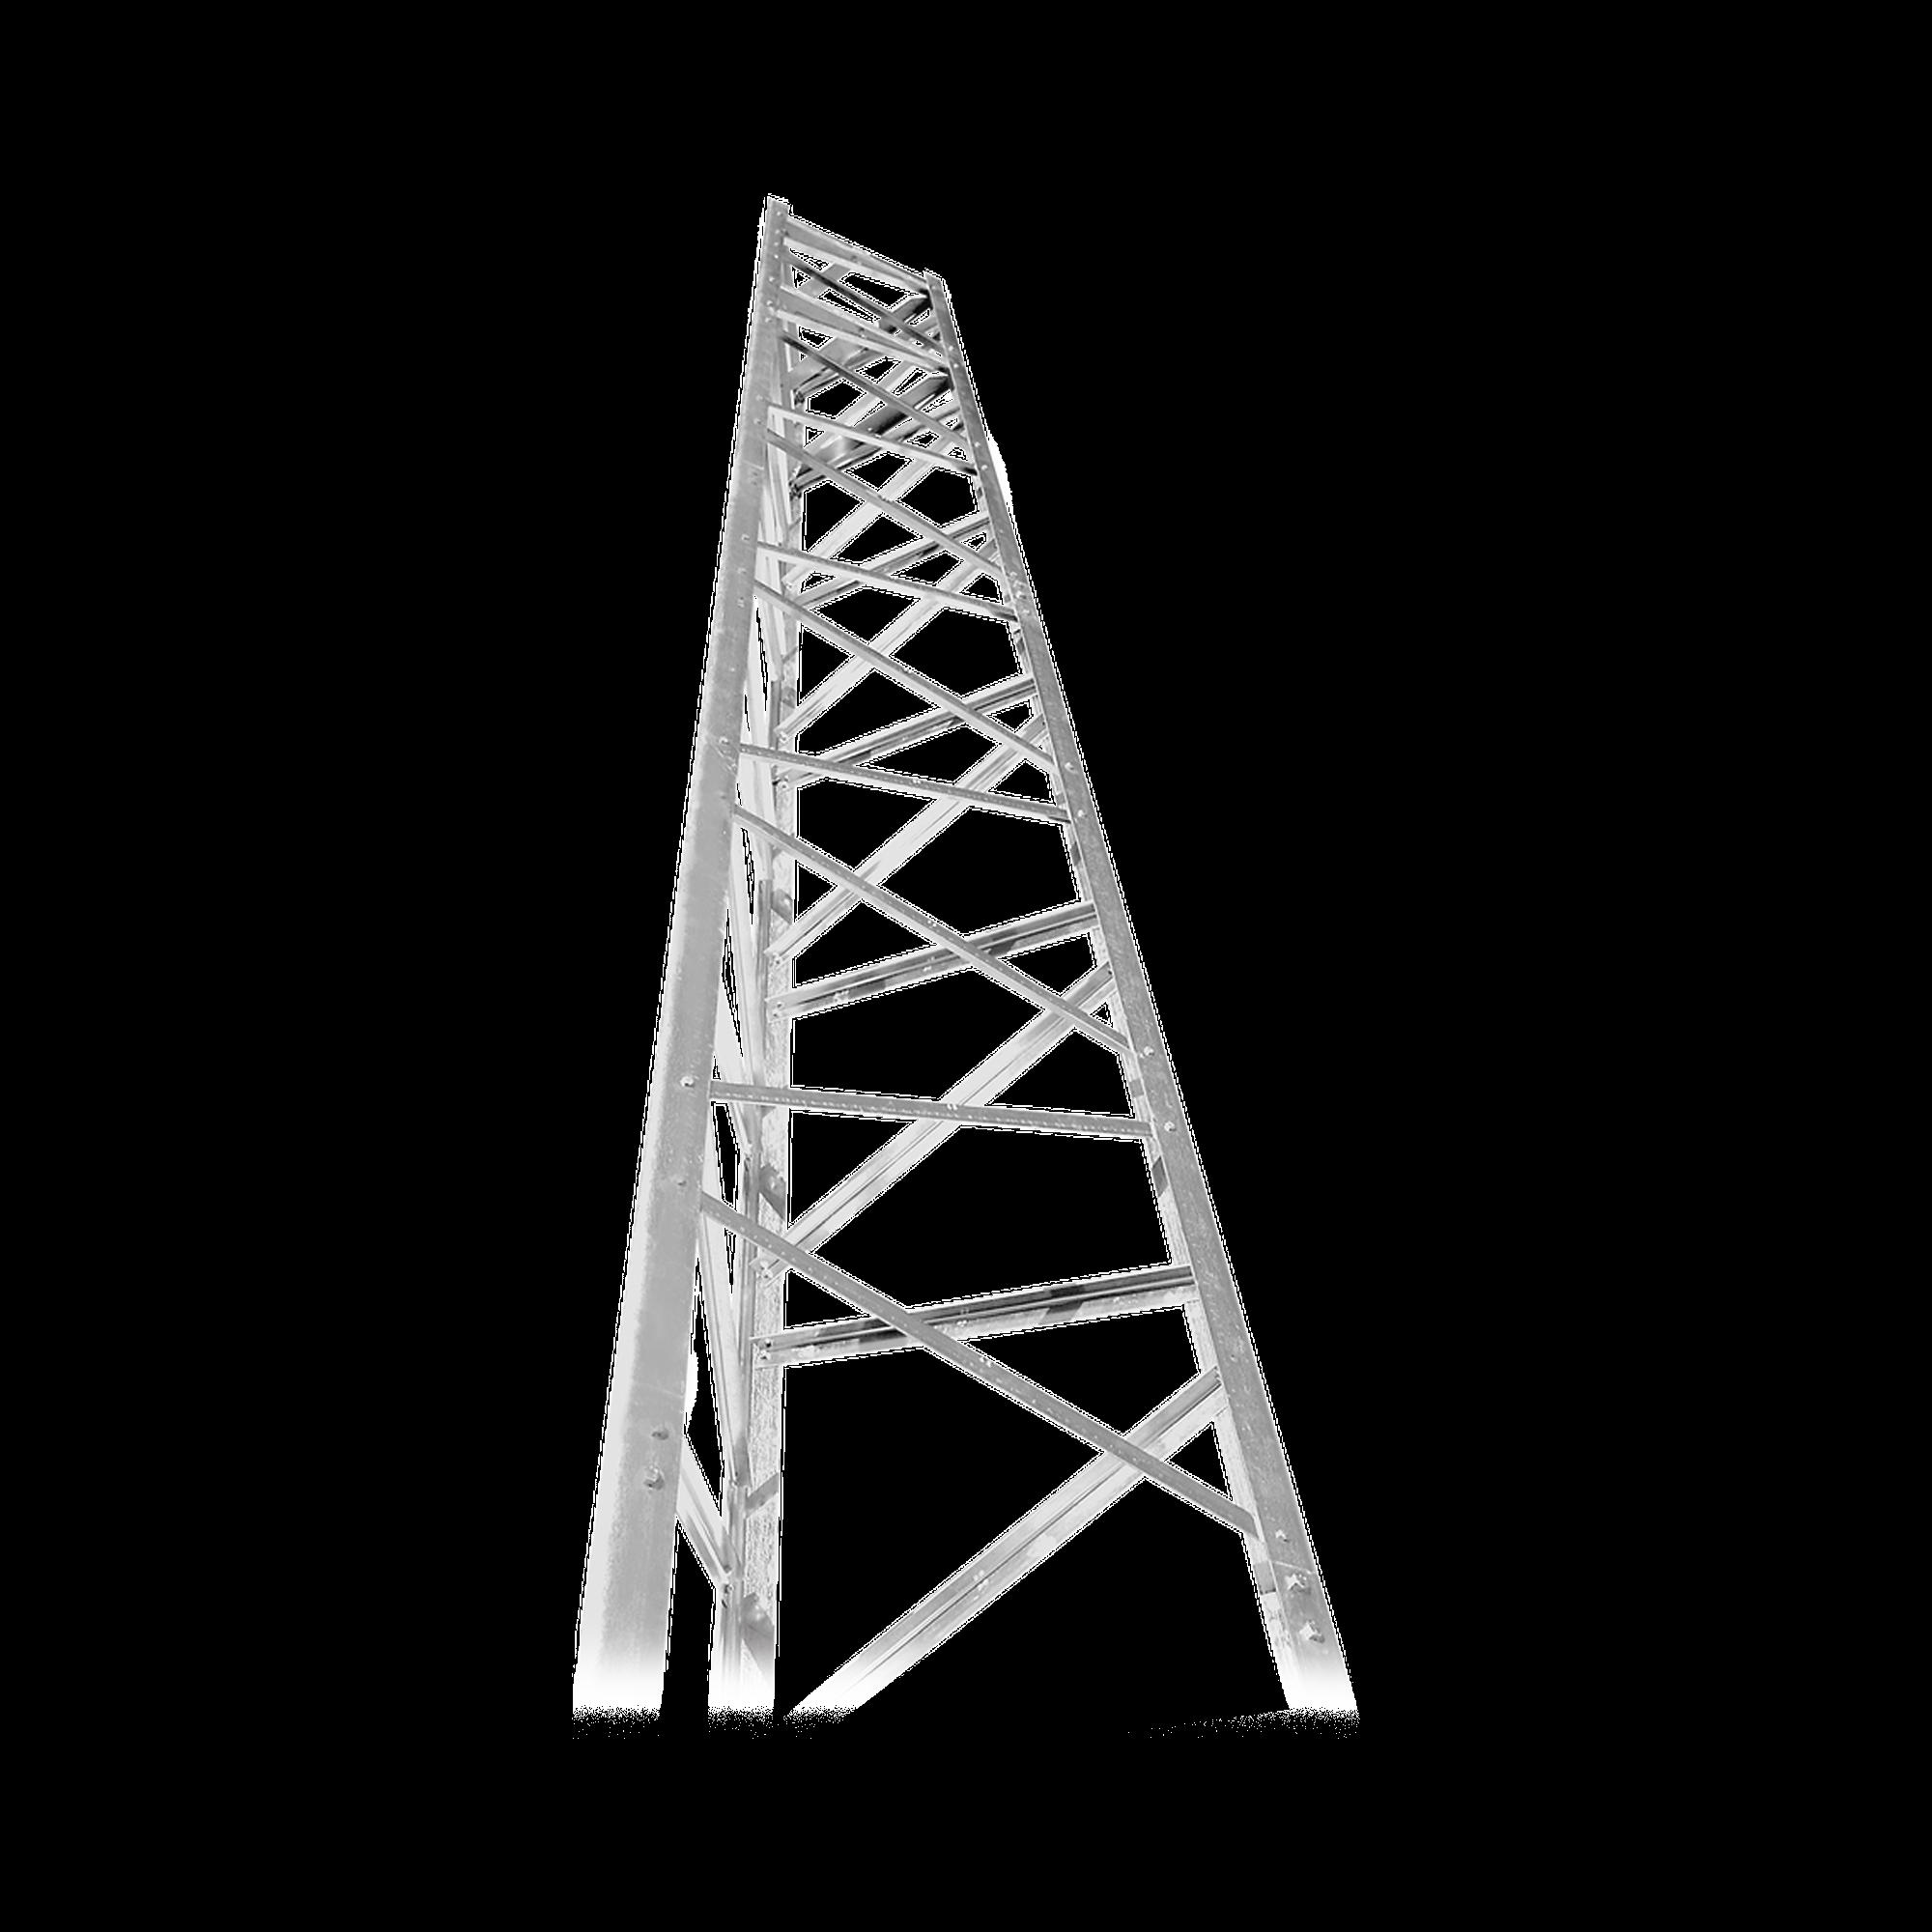 Torre Autosoportada 32 ft (9.7 m) Titan T200 Galvanizada (incluye anclaje)